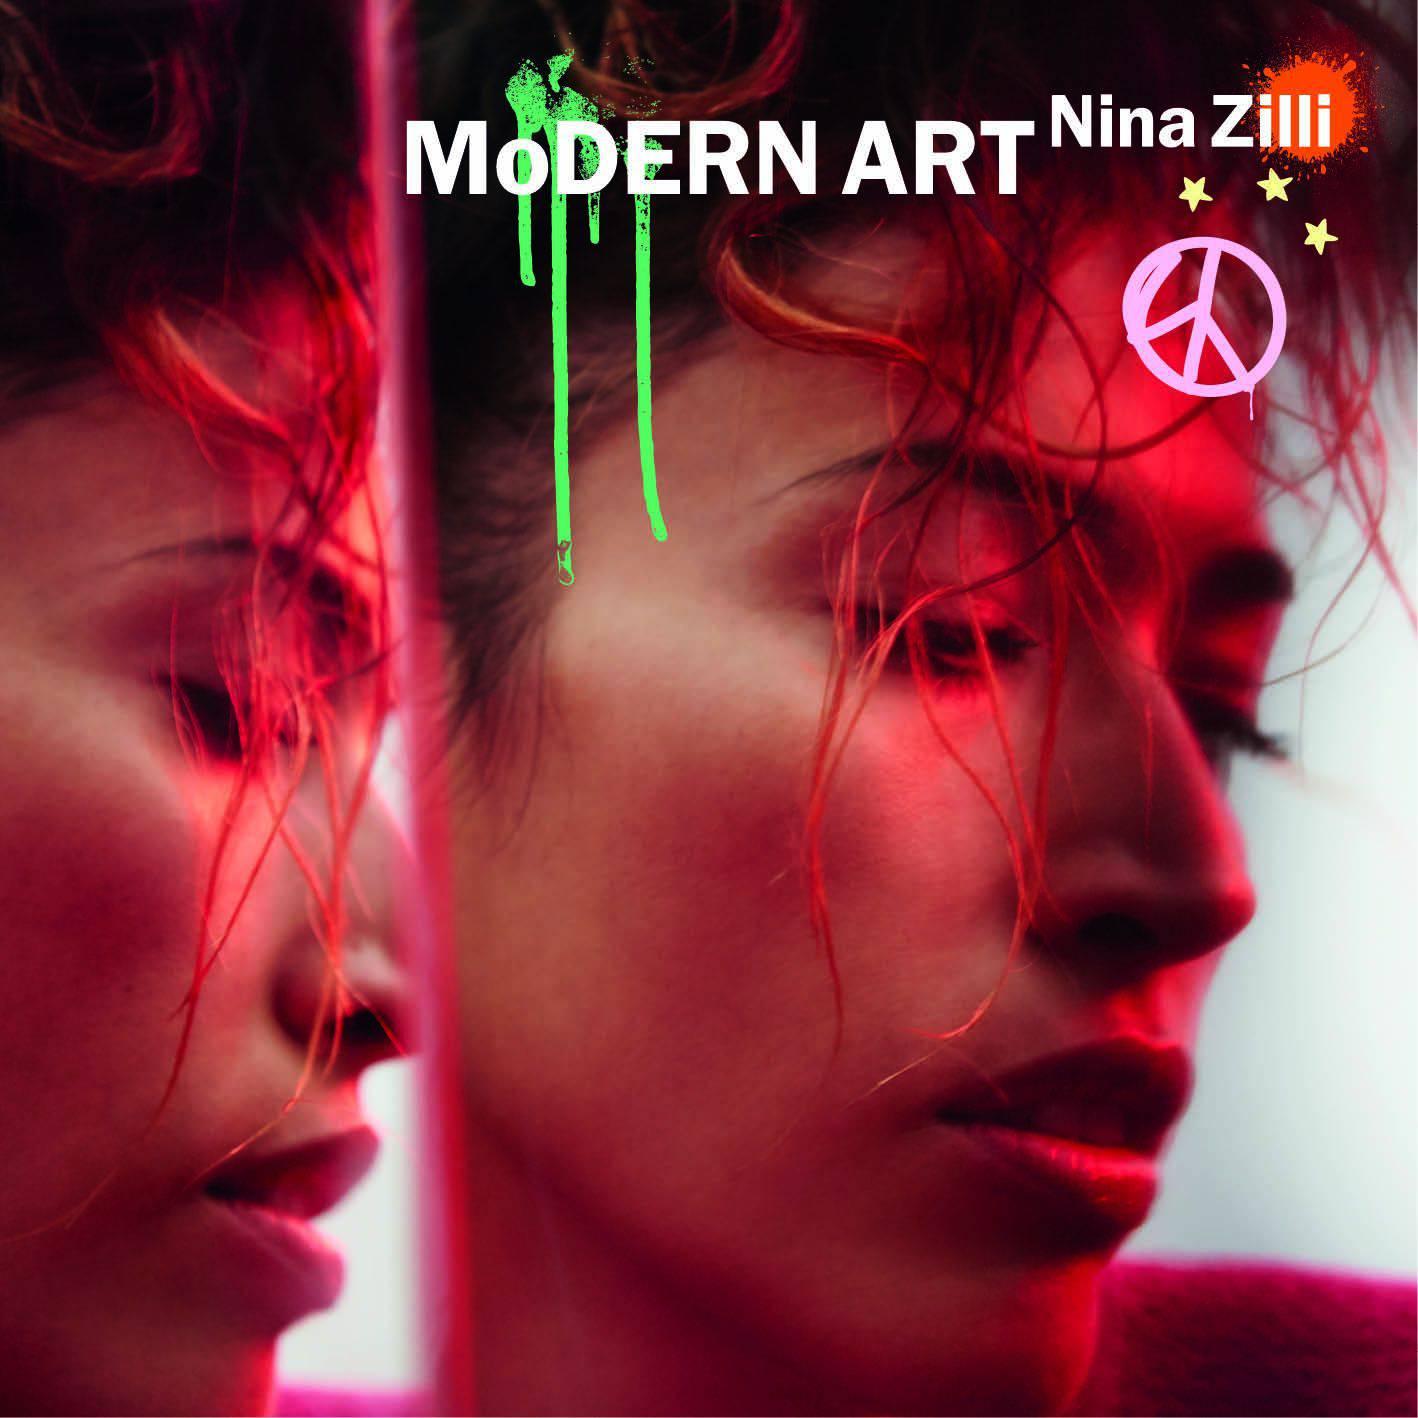 nina-zilli-modern-art